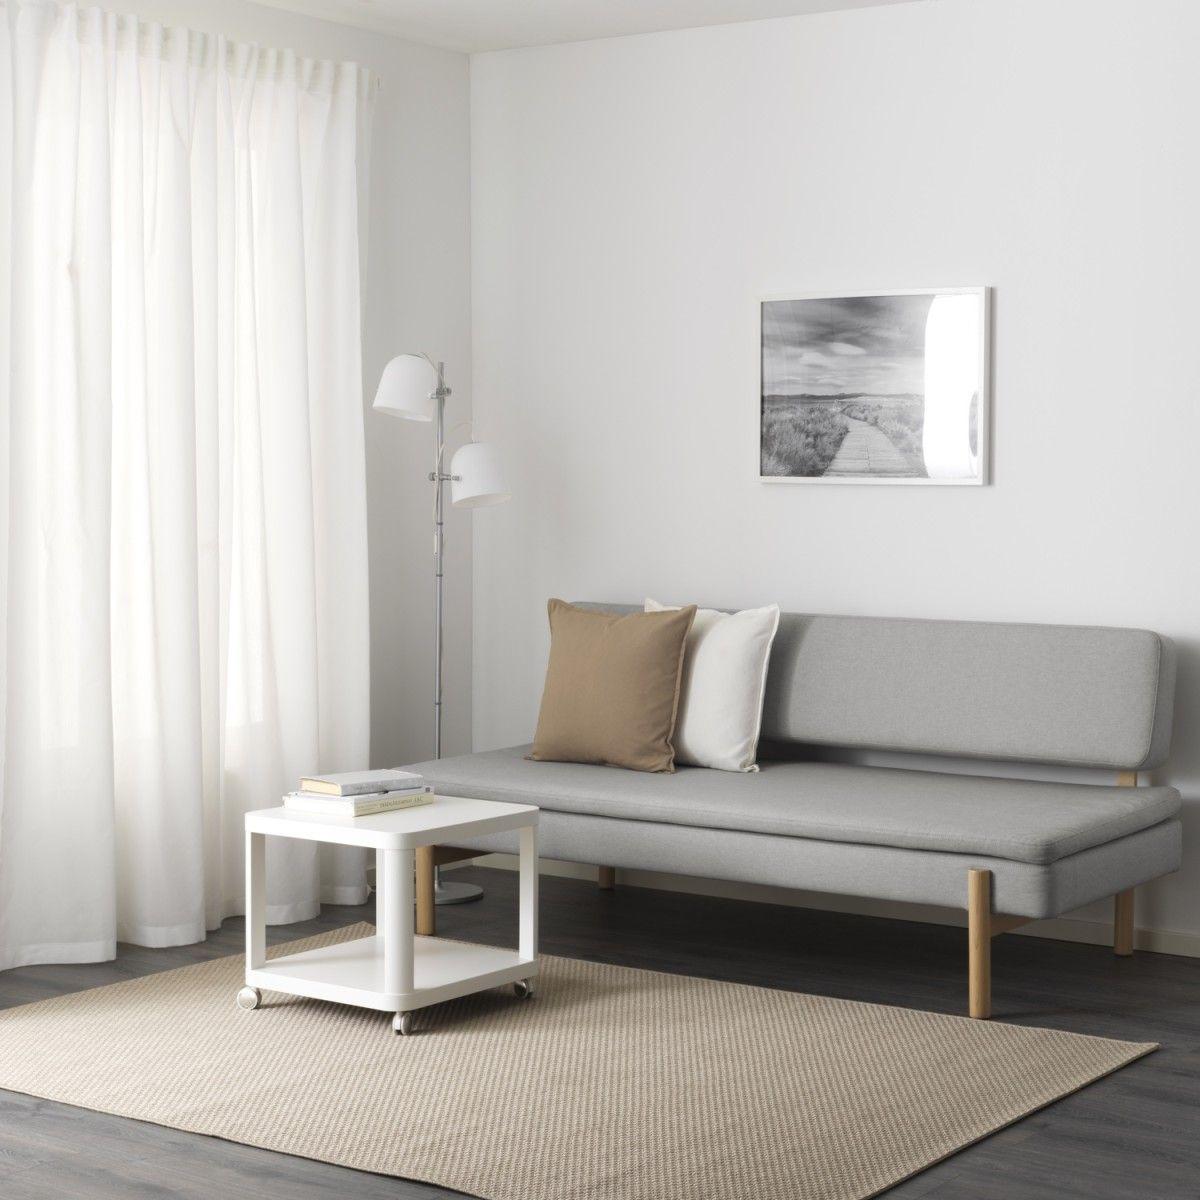 Ikea Amp Hay Debut Their Sleek Minimalist Furniture